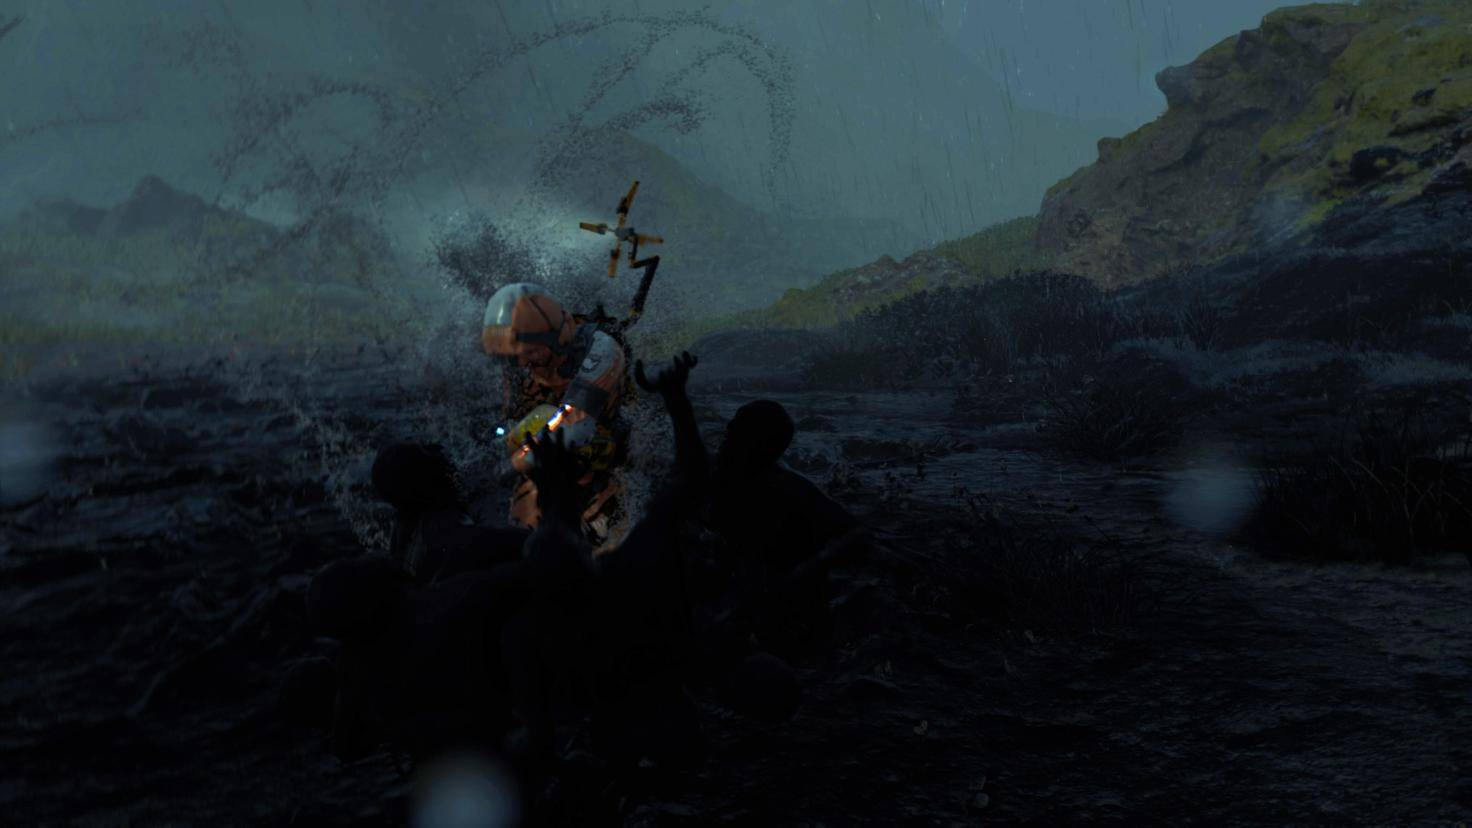 death-stranding-gd-teer-screenshot